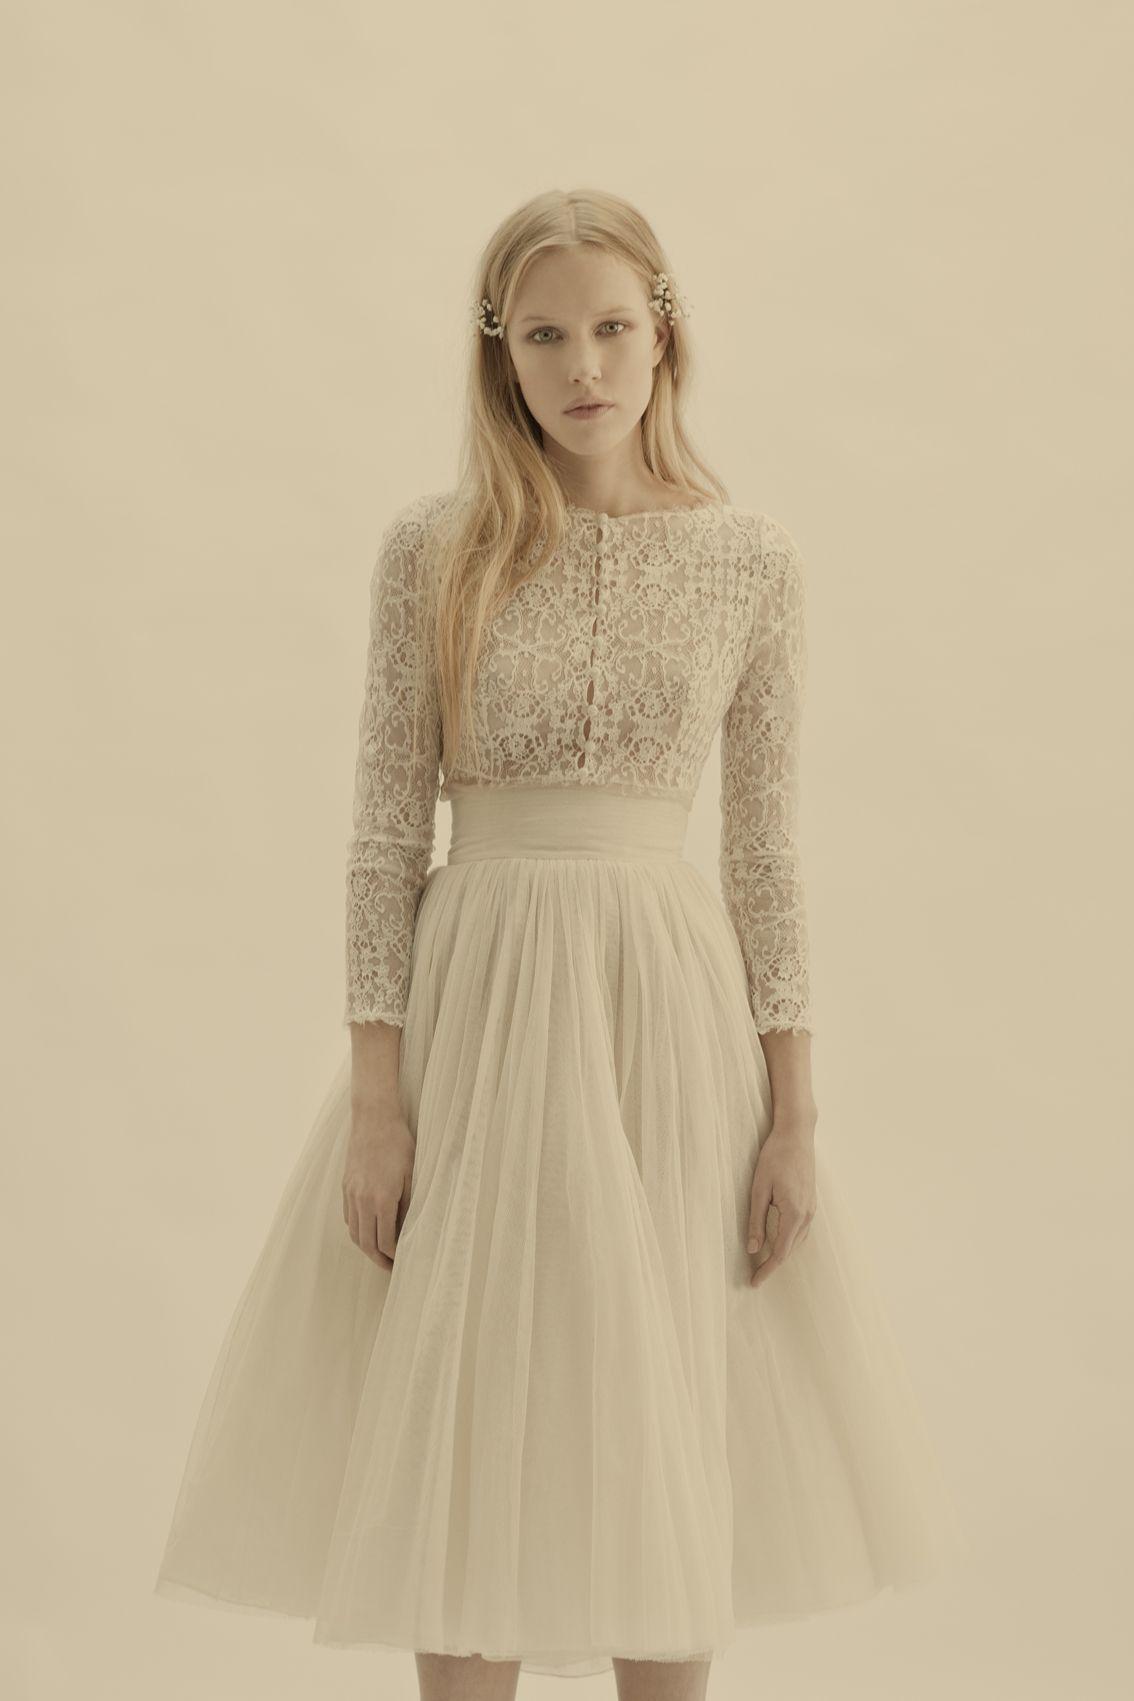 wedding dresses, cocktail dresses. E-shop www.cortana.es ...